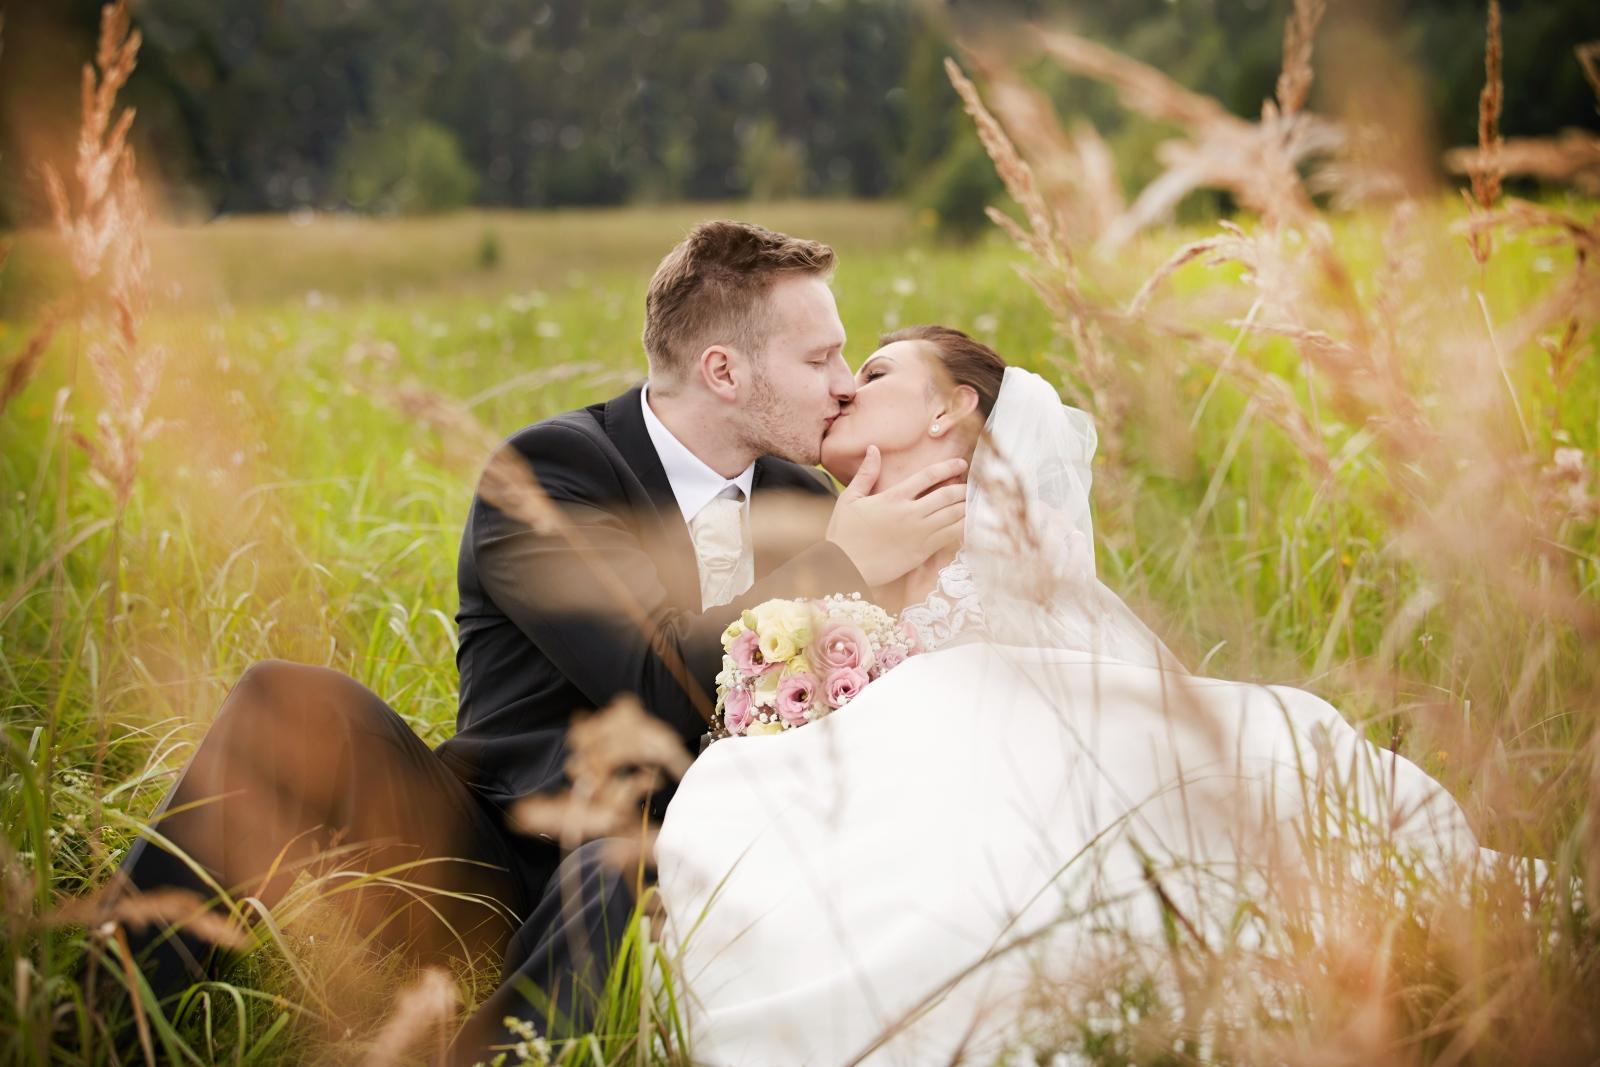 Svadba M+M - Obrázok č. 2